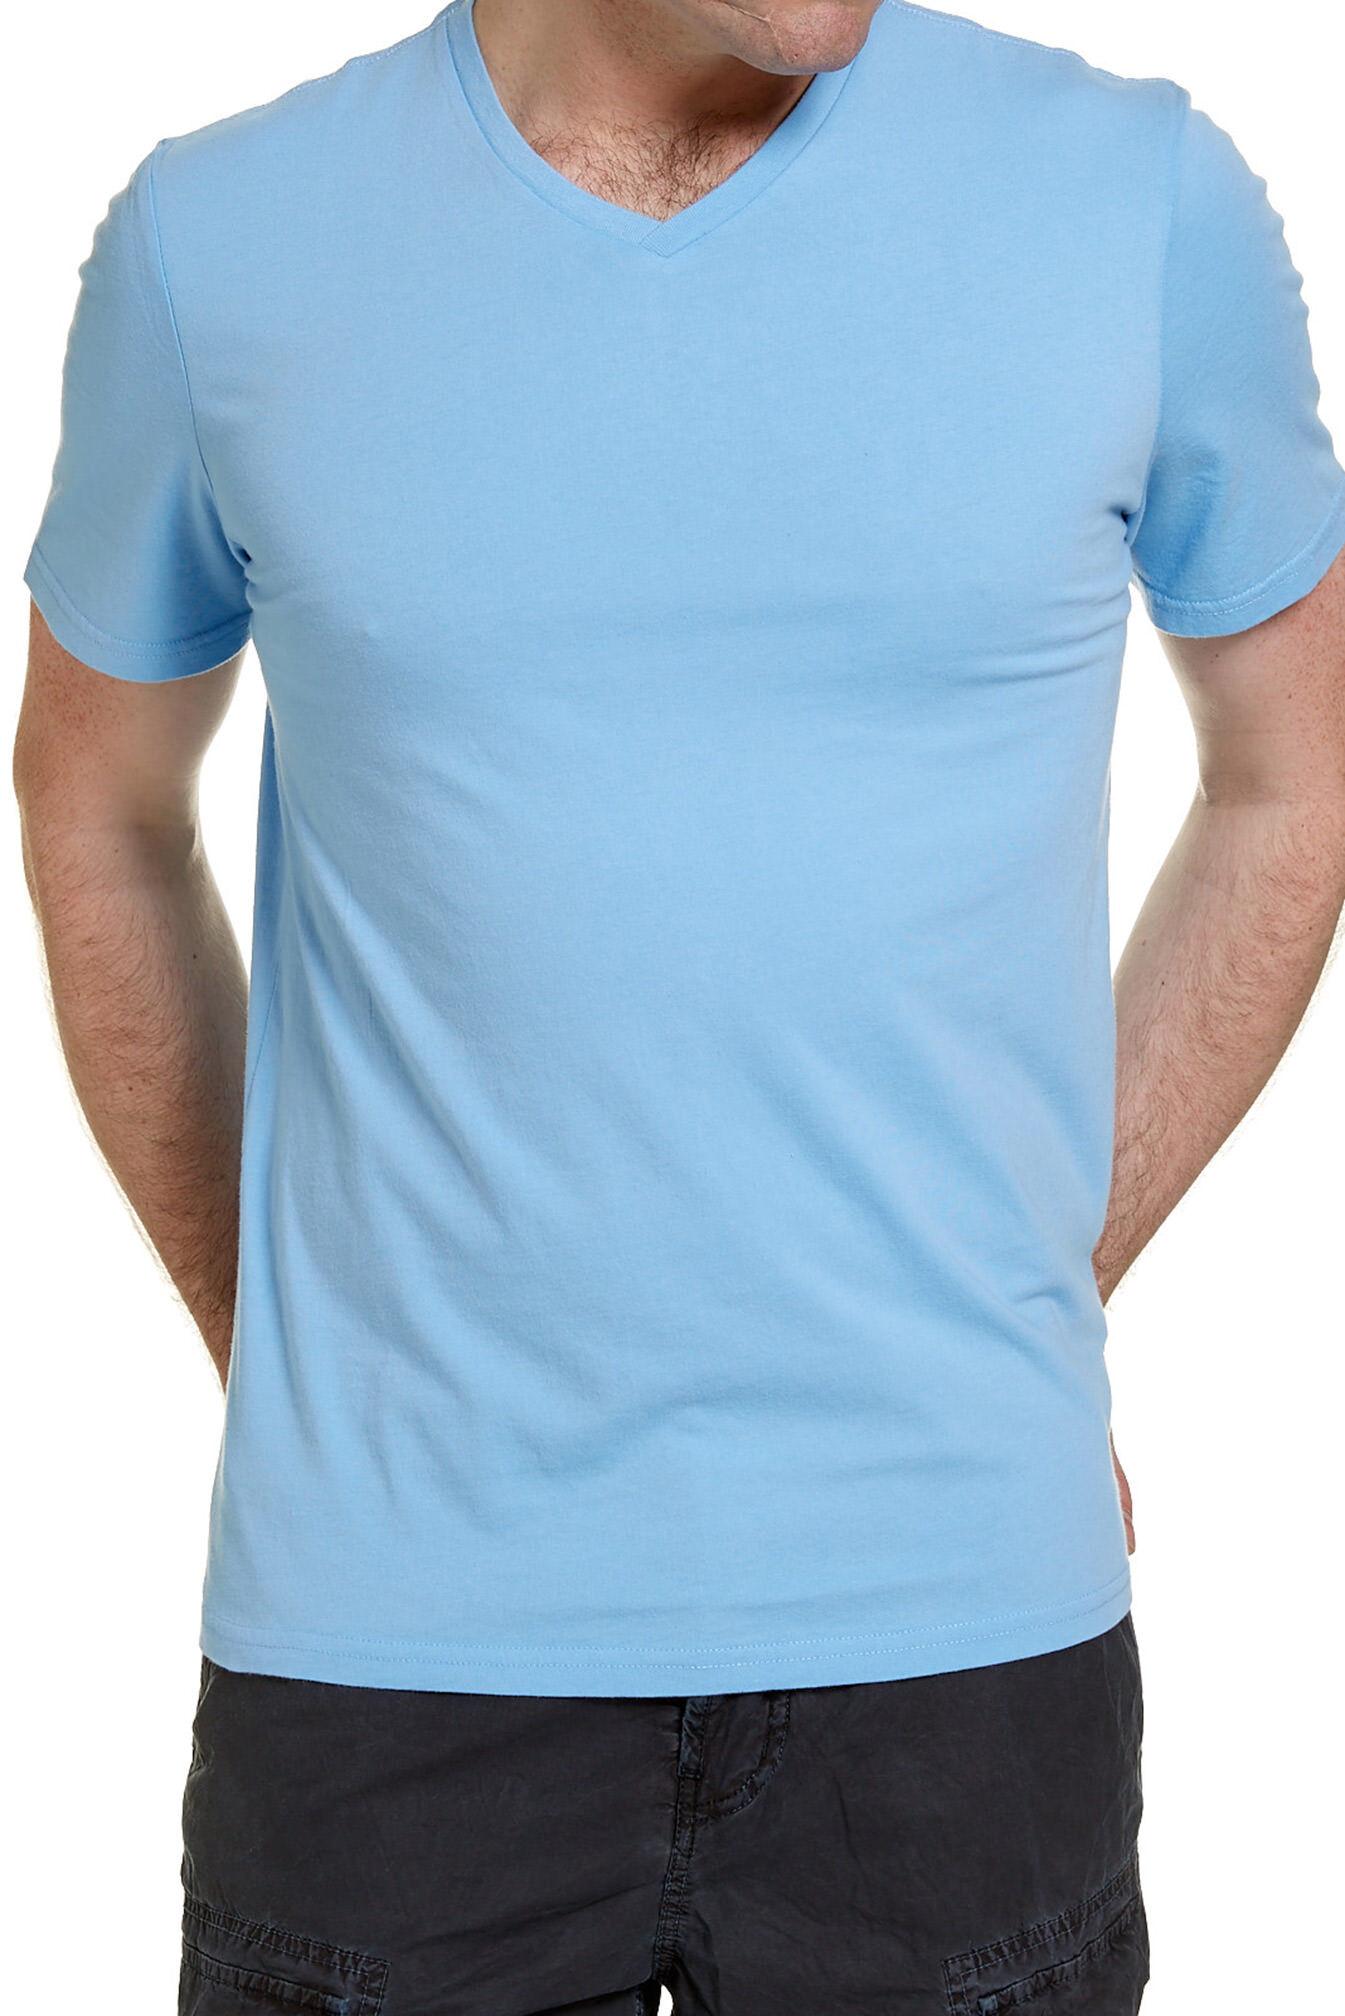 NEW-JAG-MENS-BASIC-V-NECK-TEE-T-Shirts